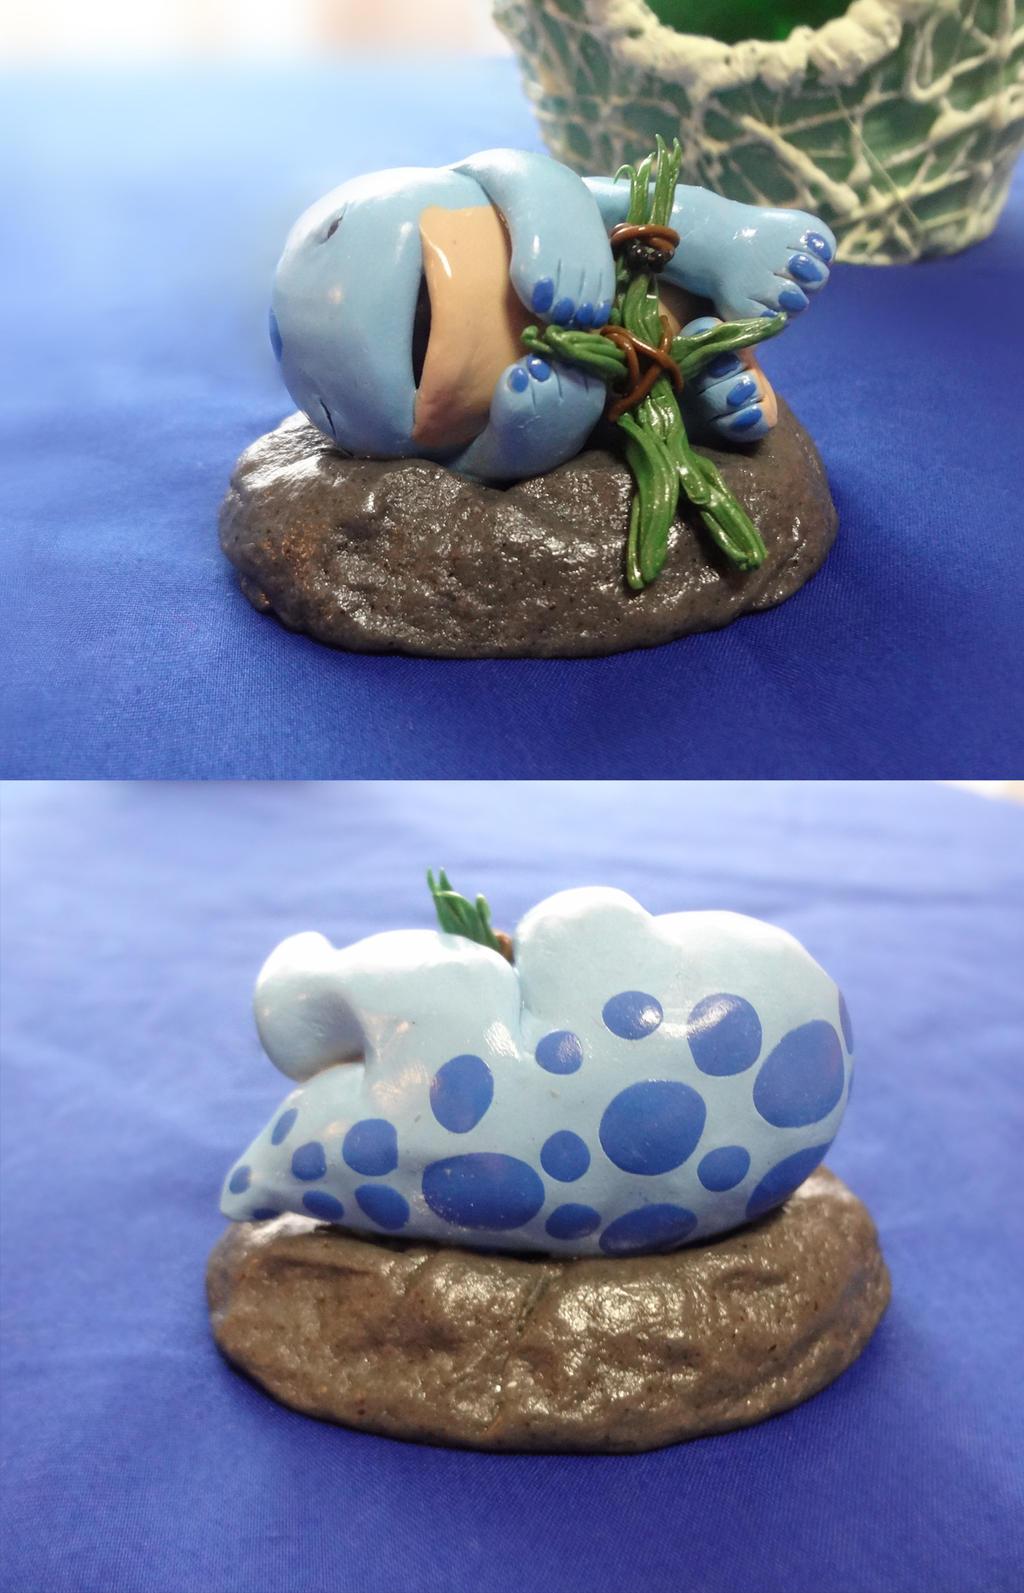 Sleeping quaggan figurine